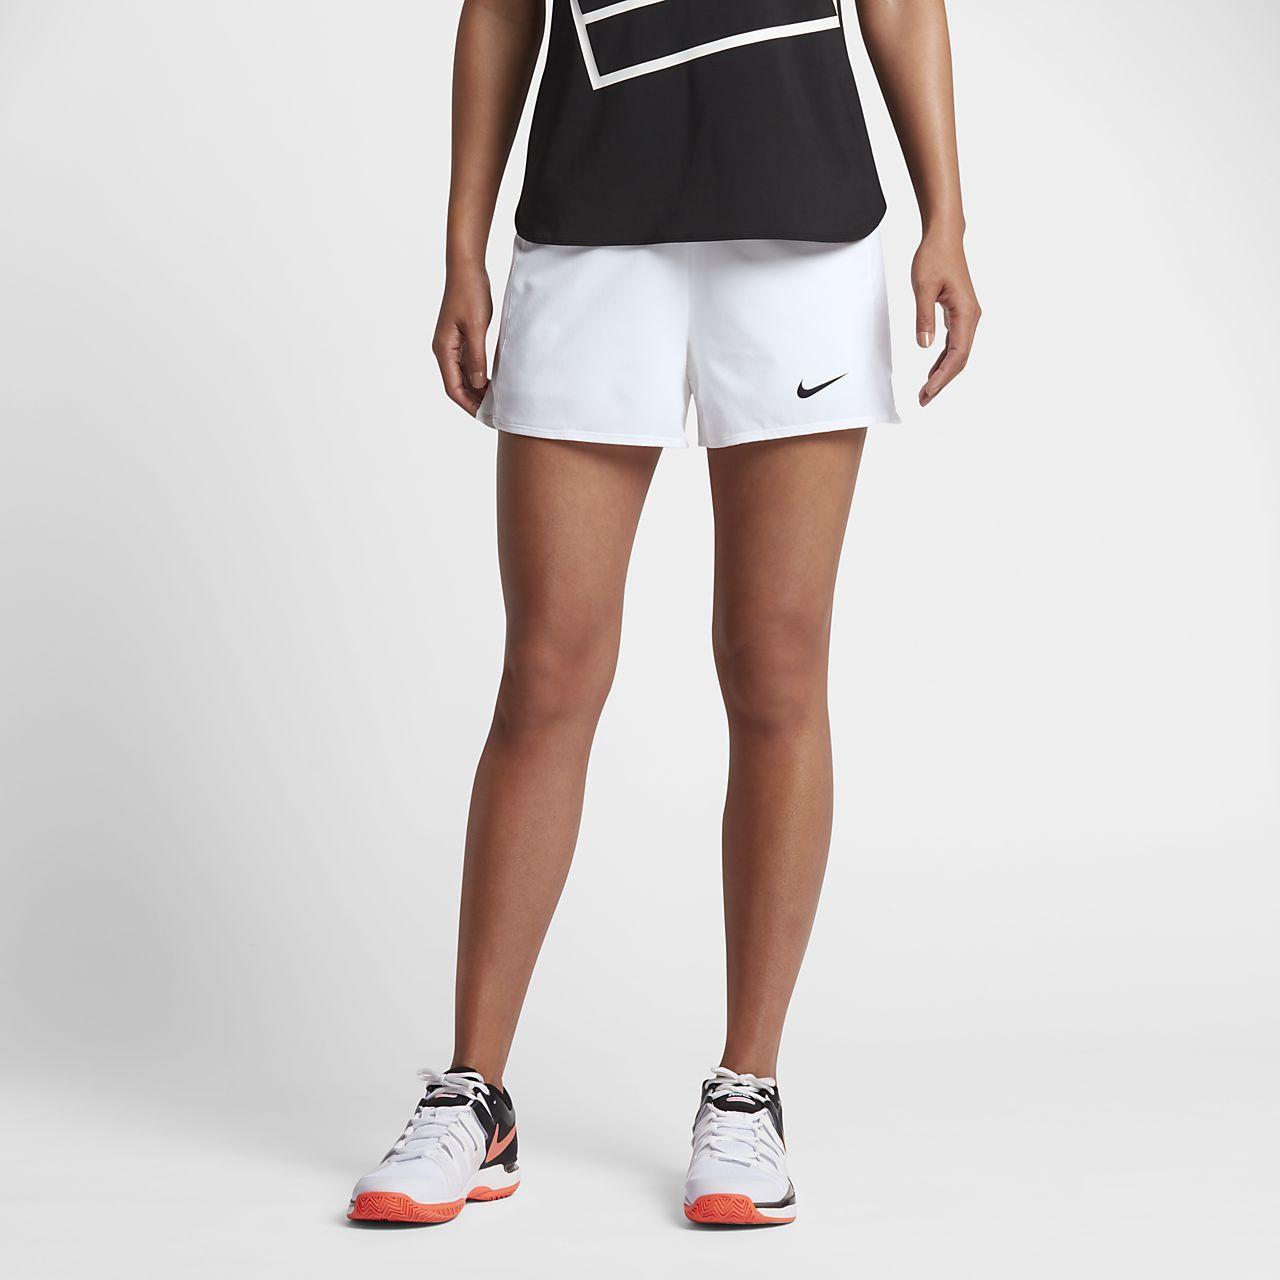 NikeCourt Flex Pure Women's Tennis Shorts